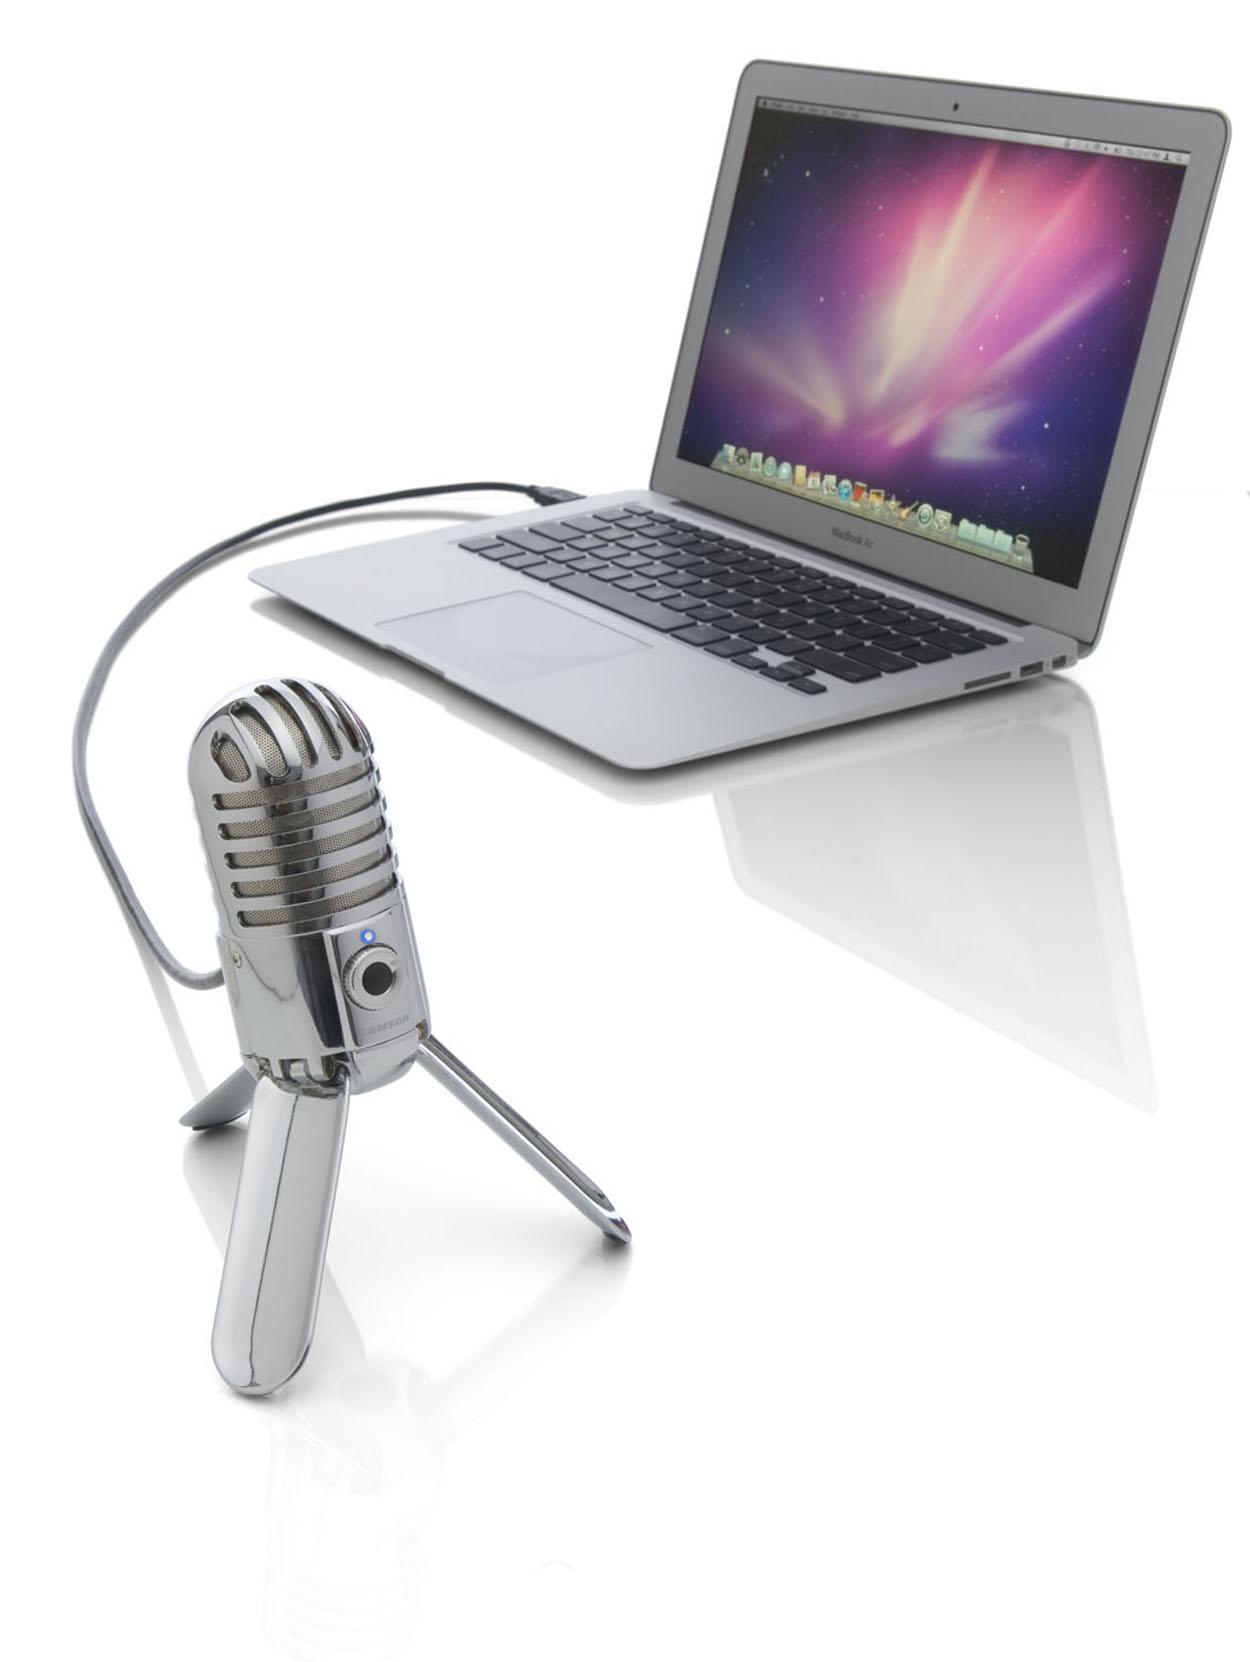 samson meteor mic usb studio condenser microphone new zealand. Black Bedroom Furniture Sets. Home Design Ideas